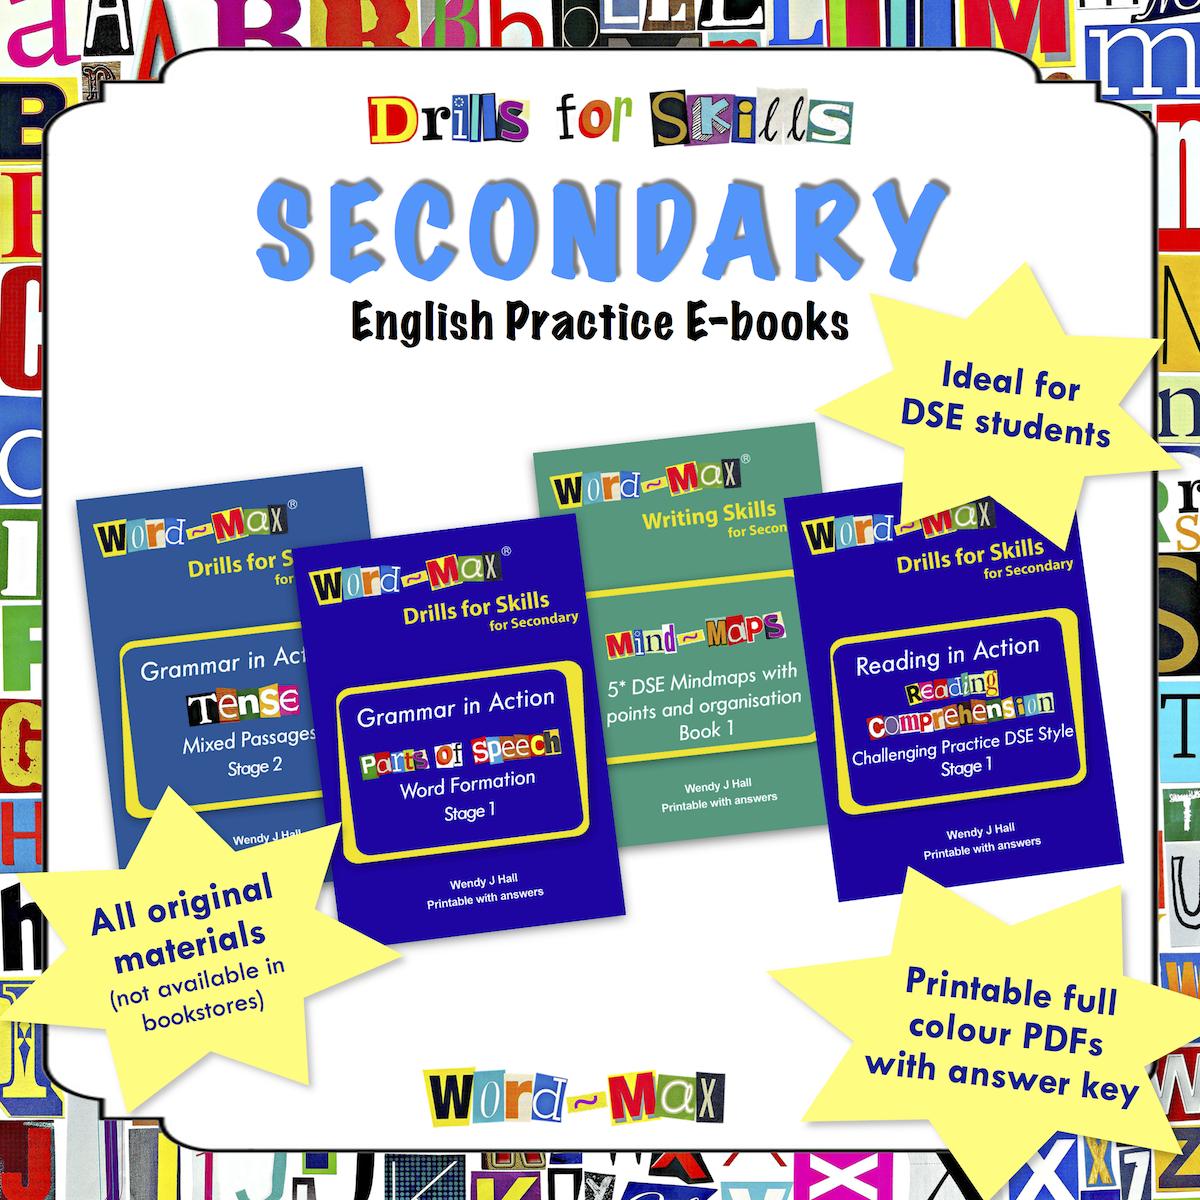 Secondary English Practice e-Books